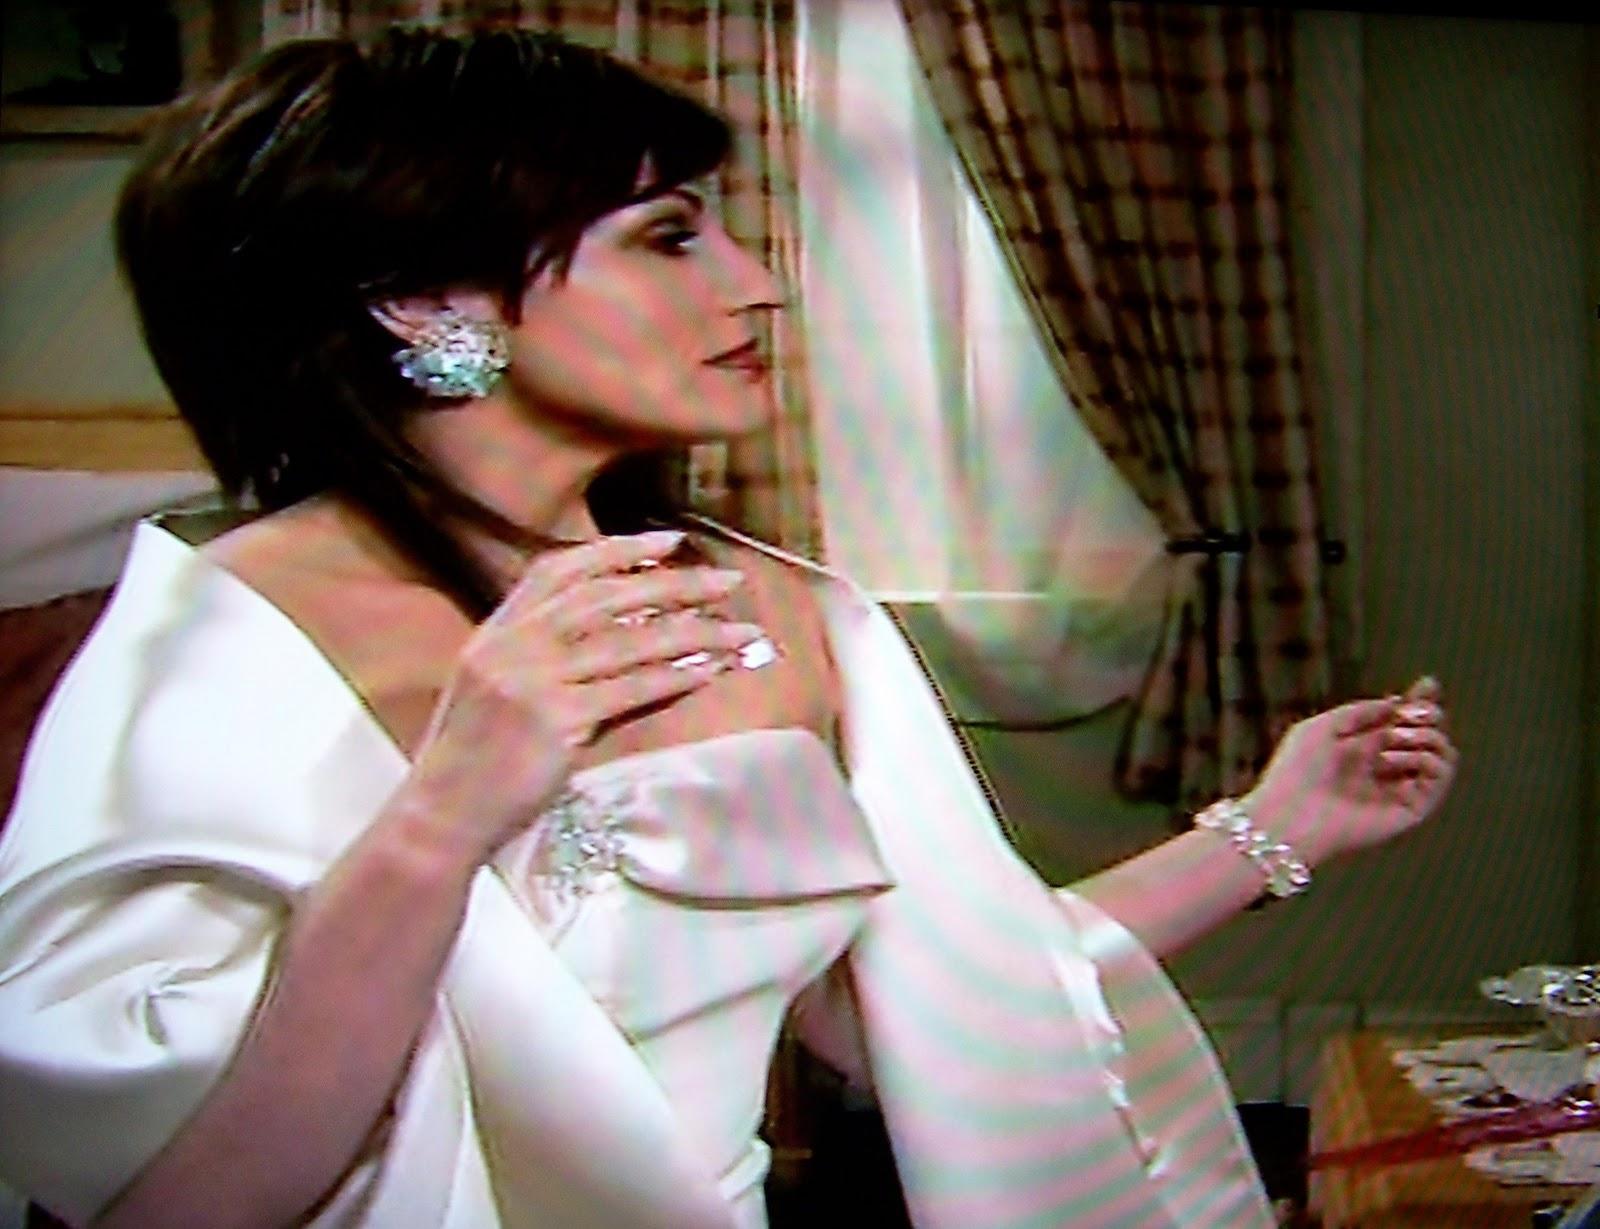 Isidingo+Cherel+getting+married+to+Braam+6+Dec+2010+003.jpg